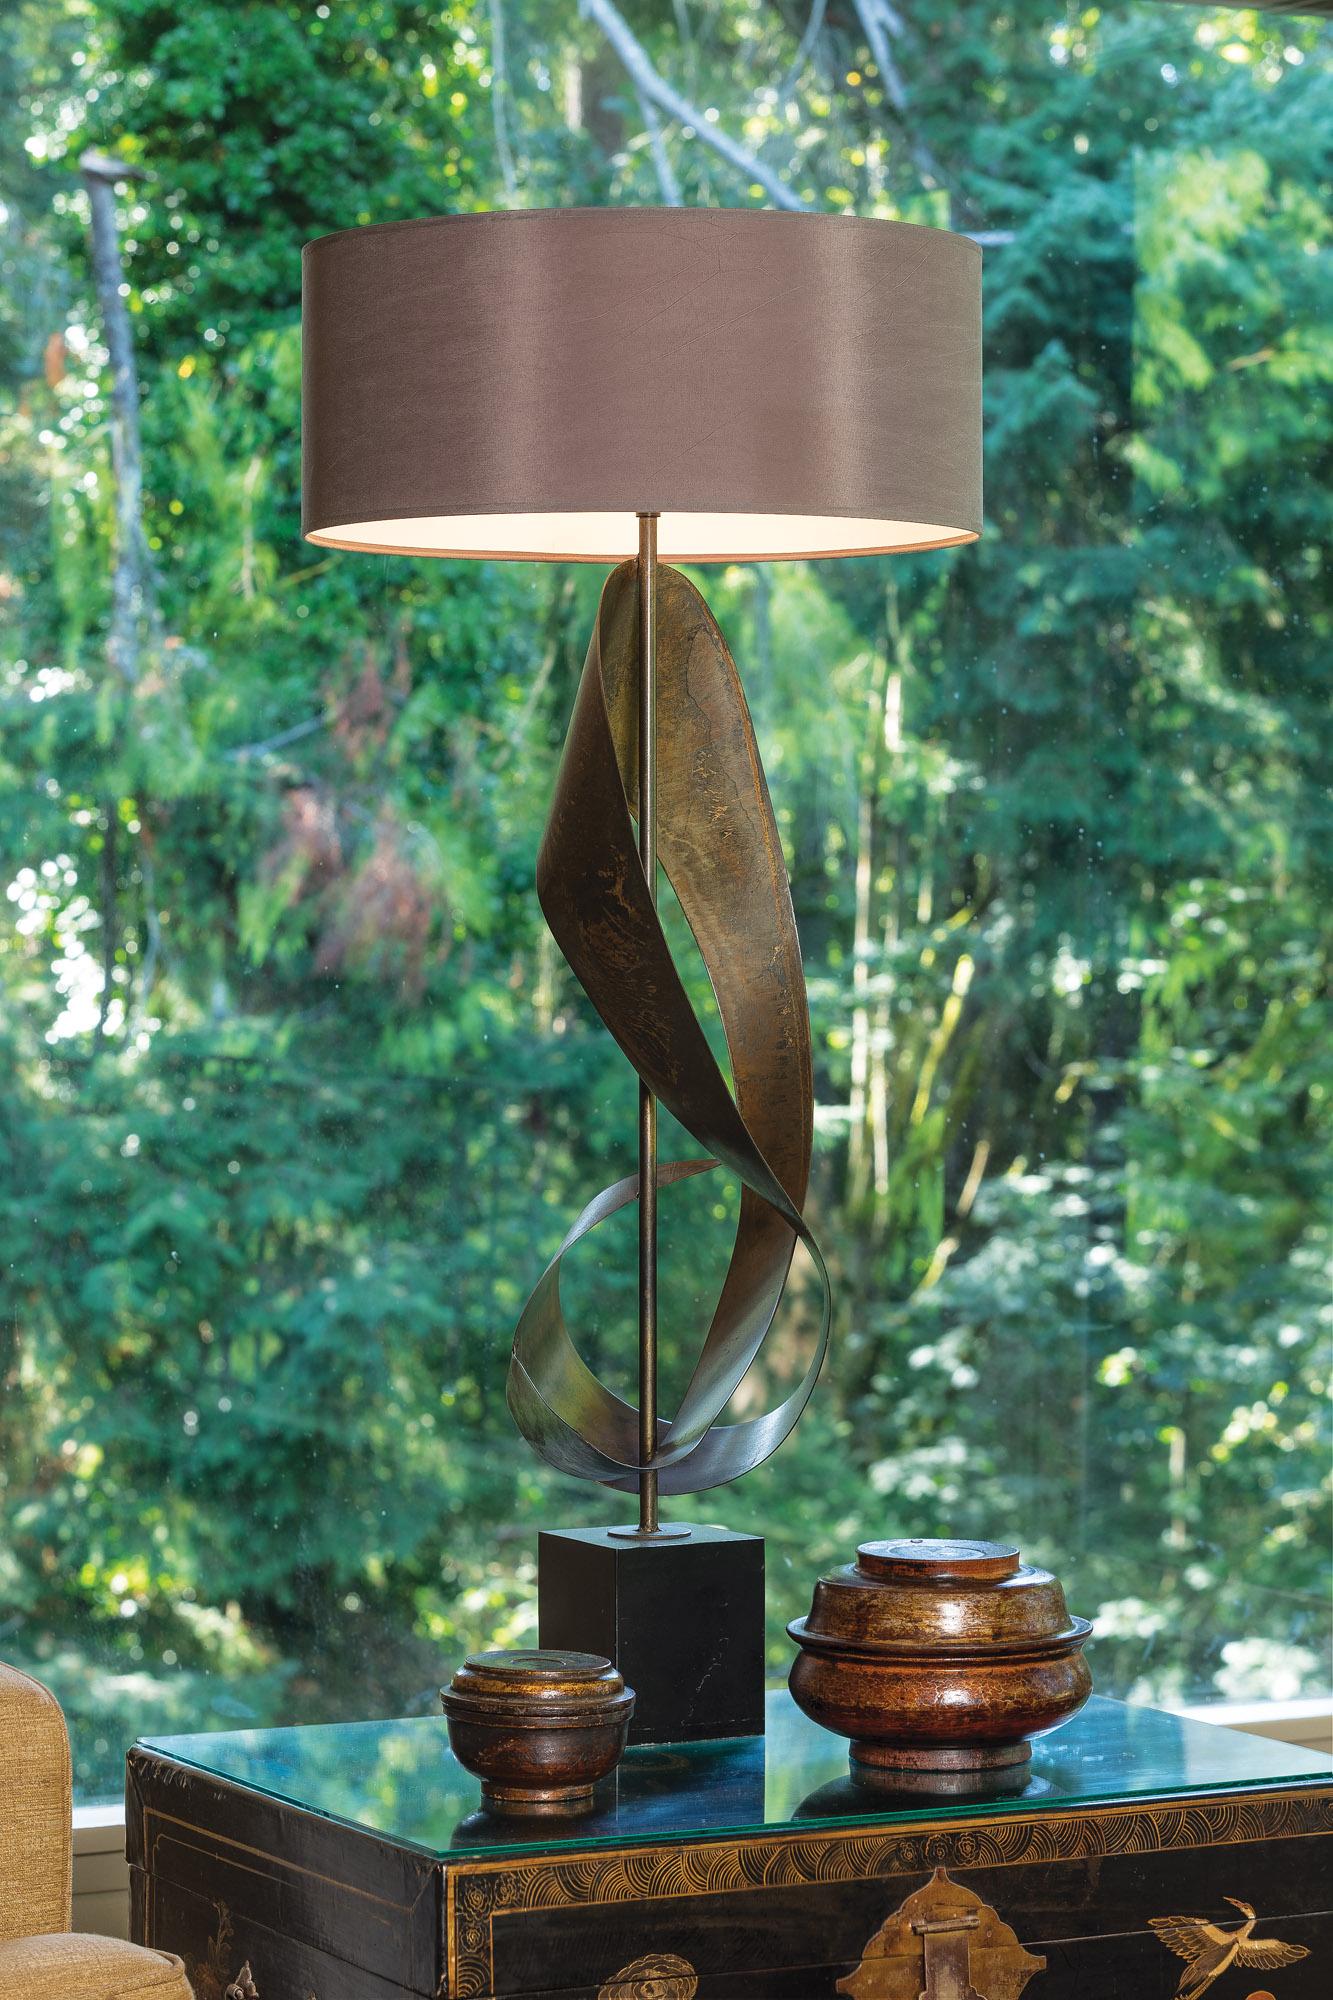 Harry Balmer lamp